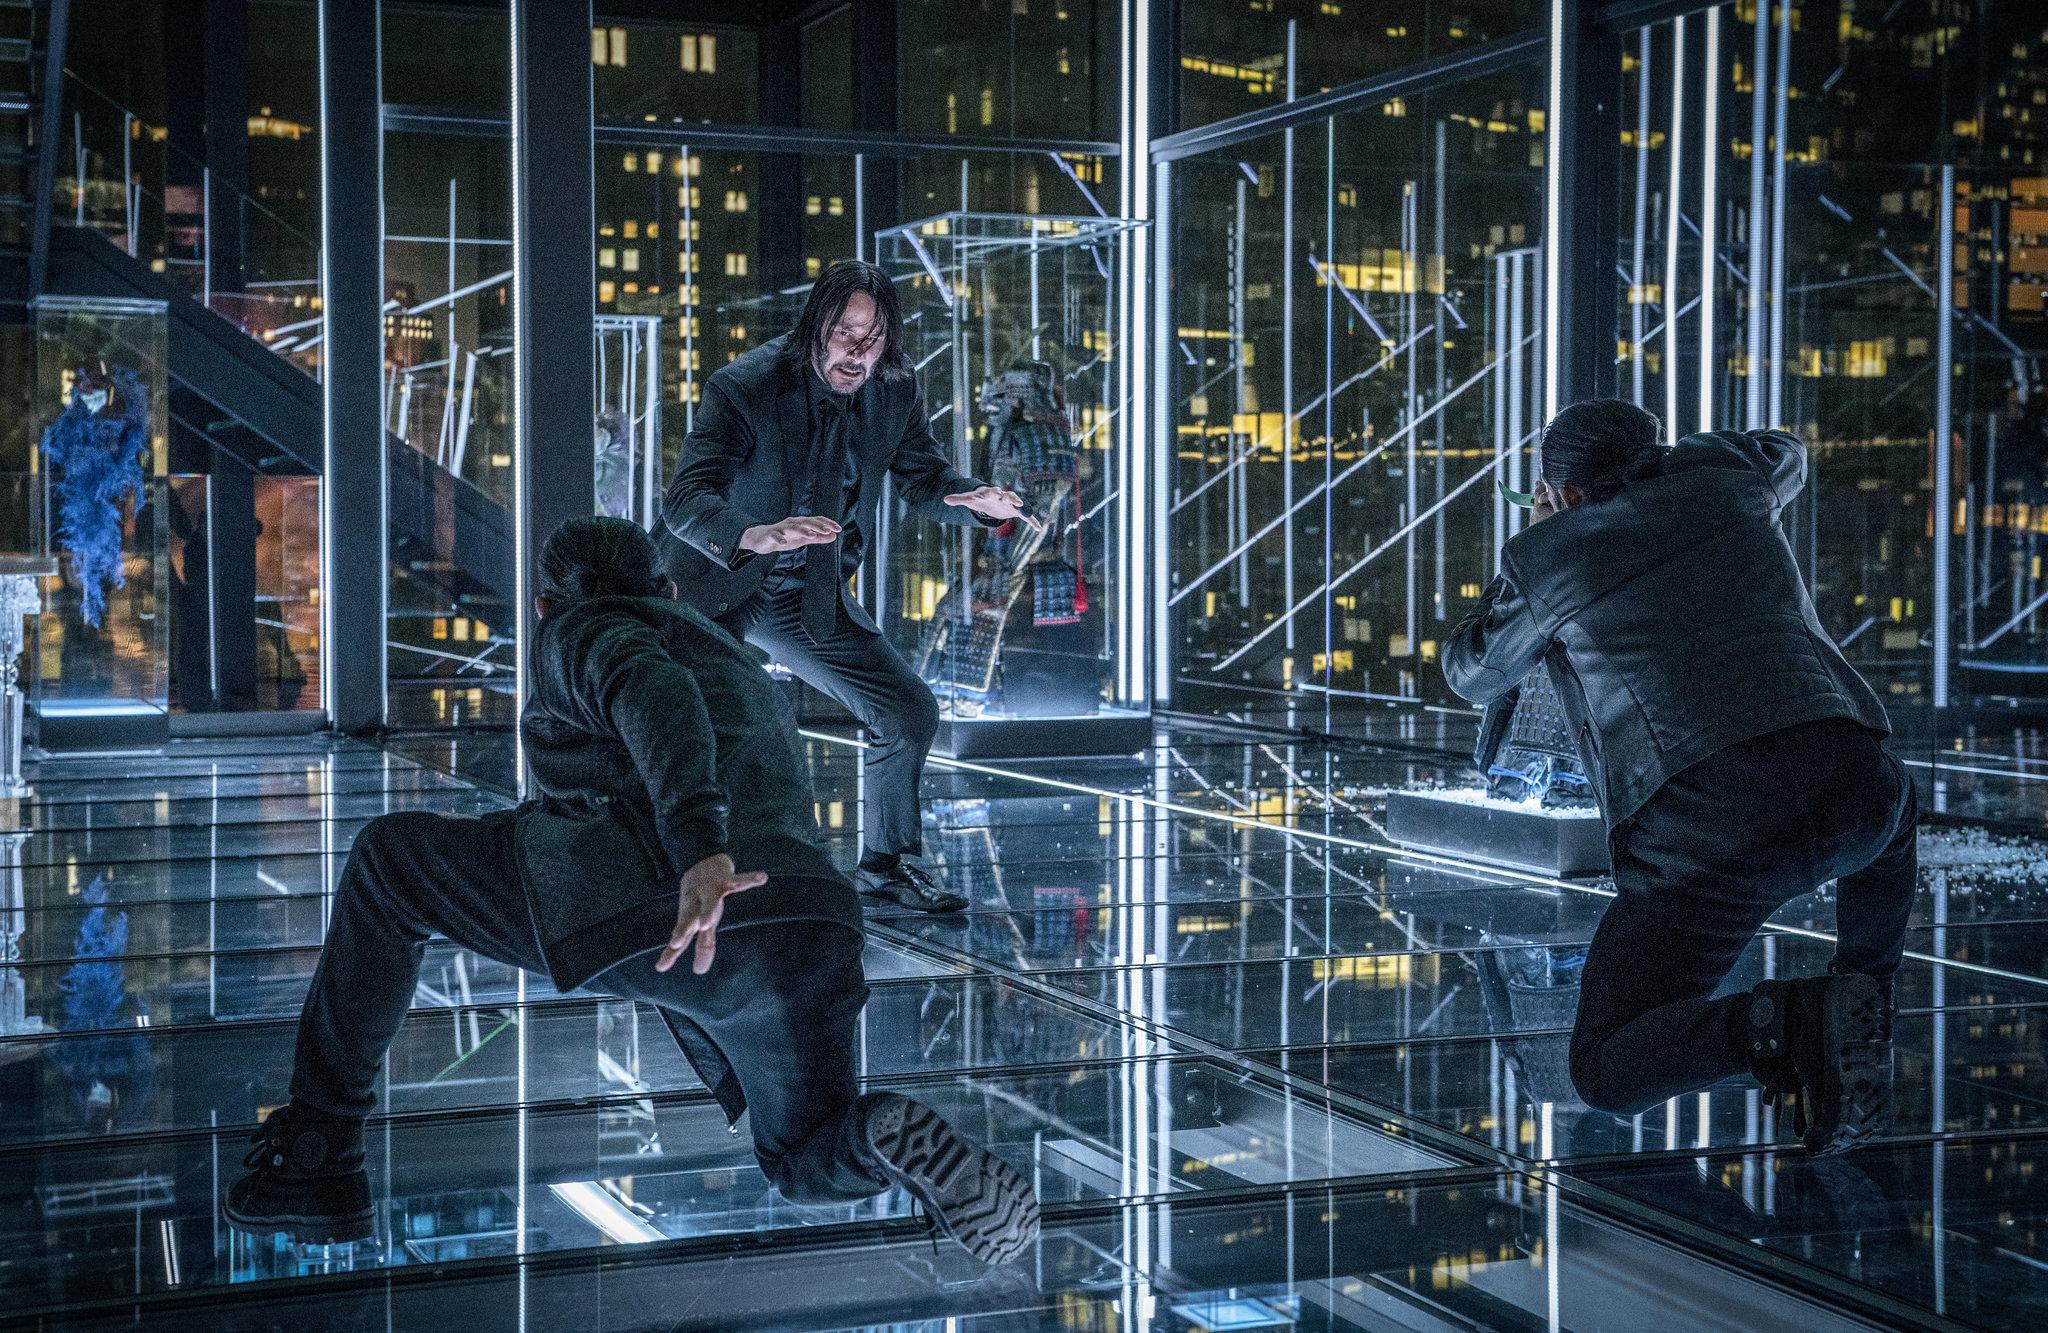 Keanu Reeves, center, stars as John Wick in